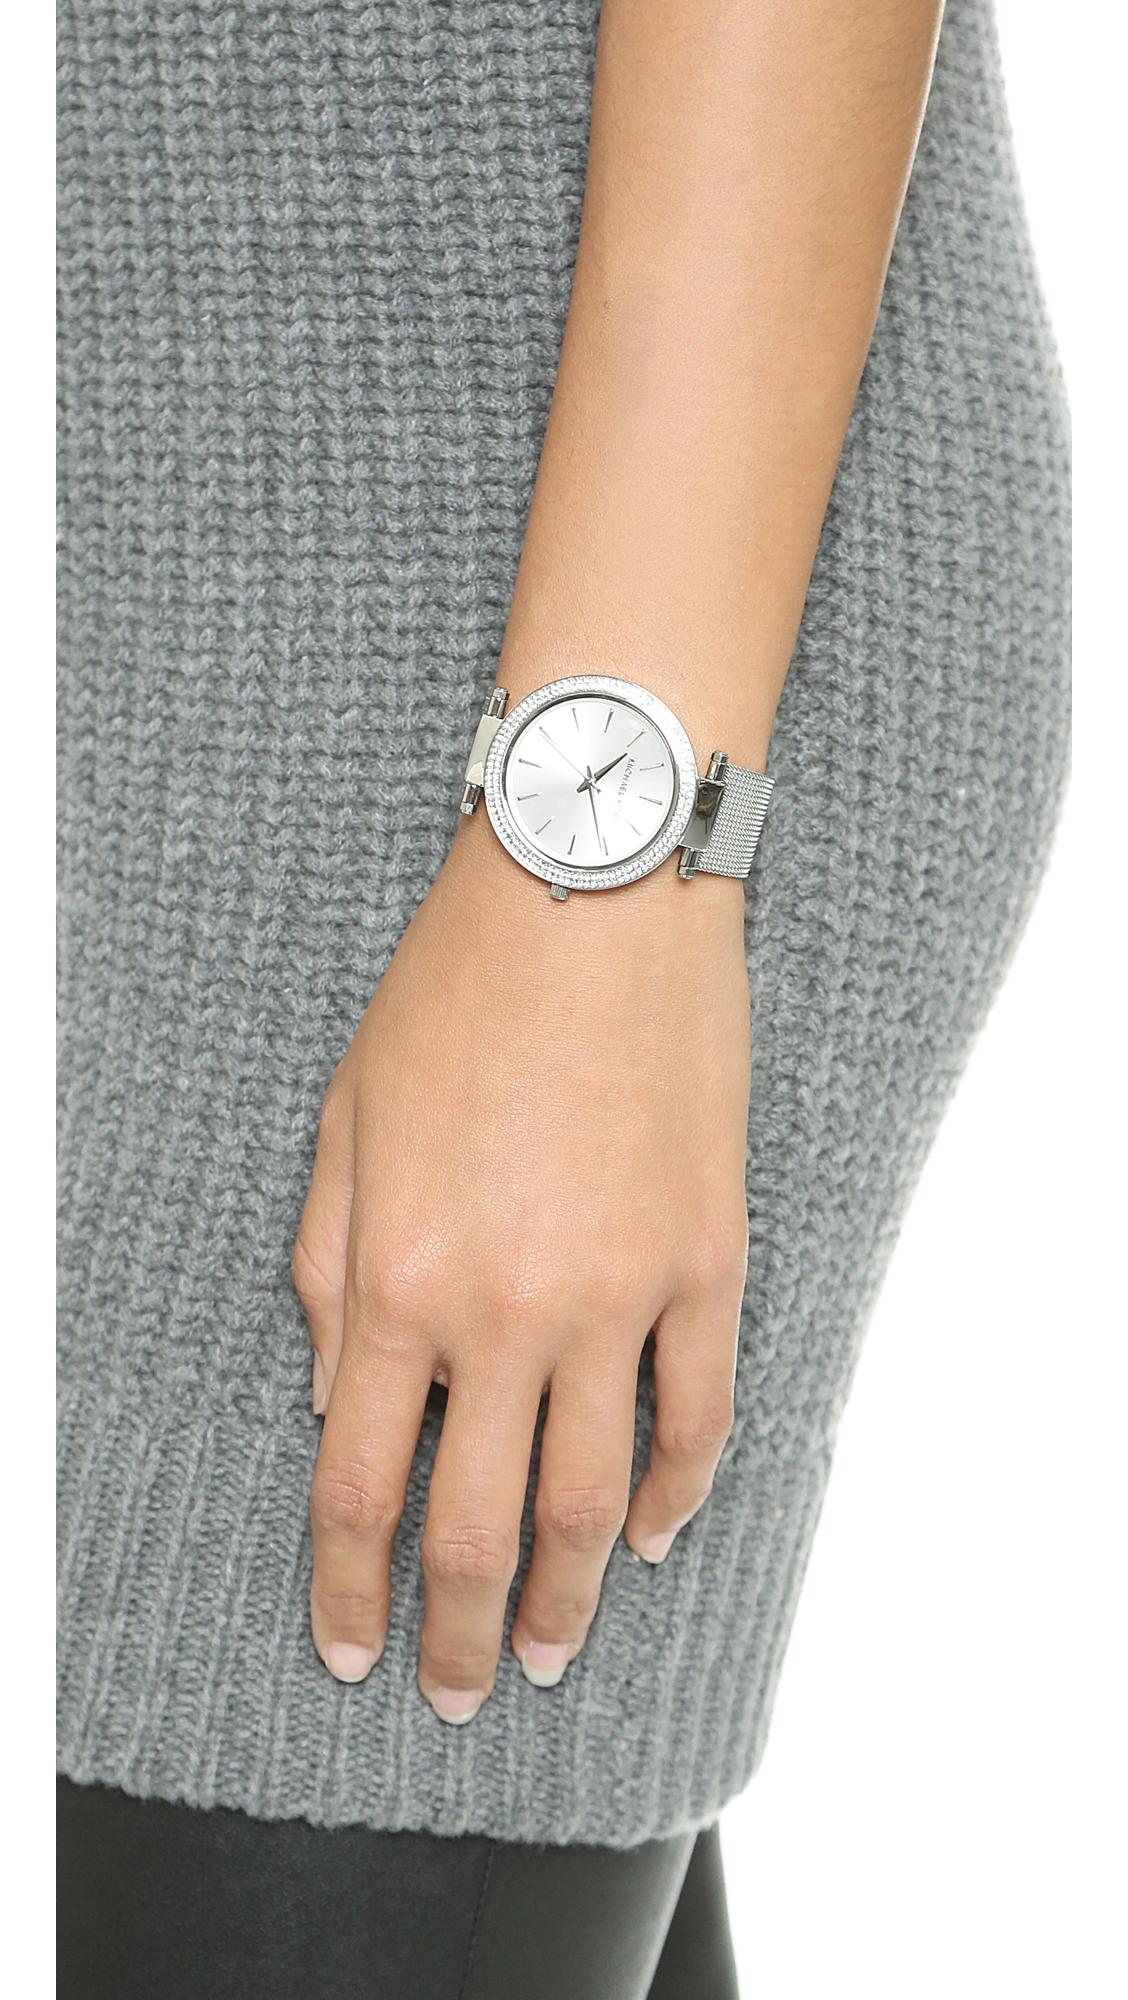 d4b2f6294827 Michael Kors Darci Watch - Silver in Metallic - Lyst